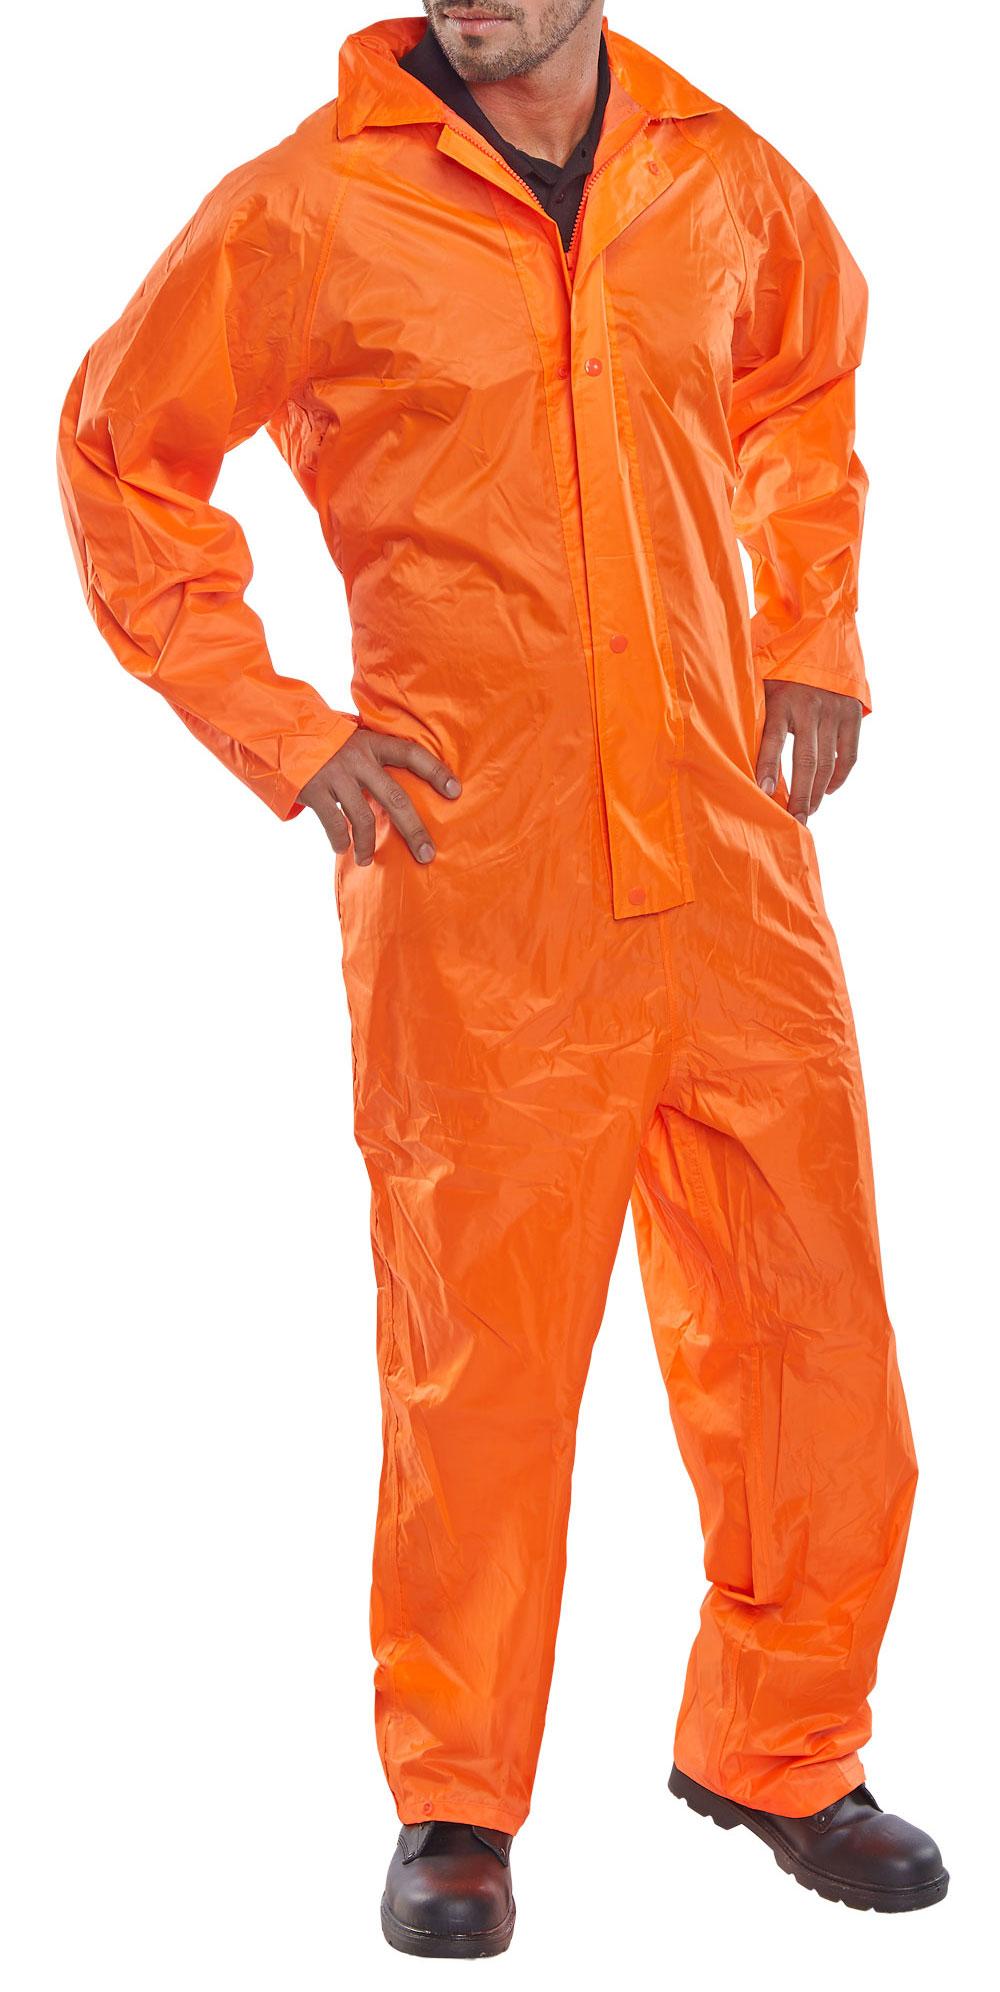 Nbdc Nylon B Dri Coverall Orange Beeswift